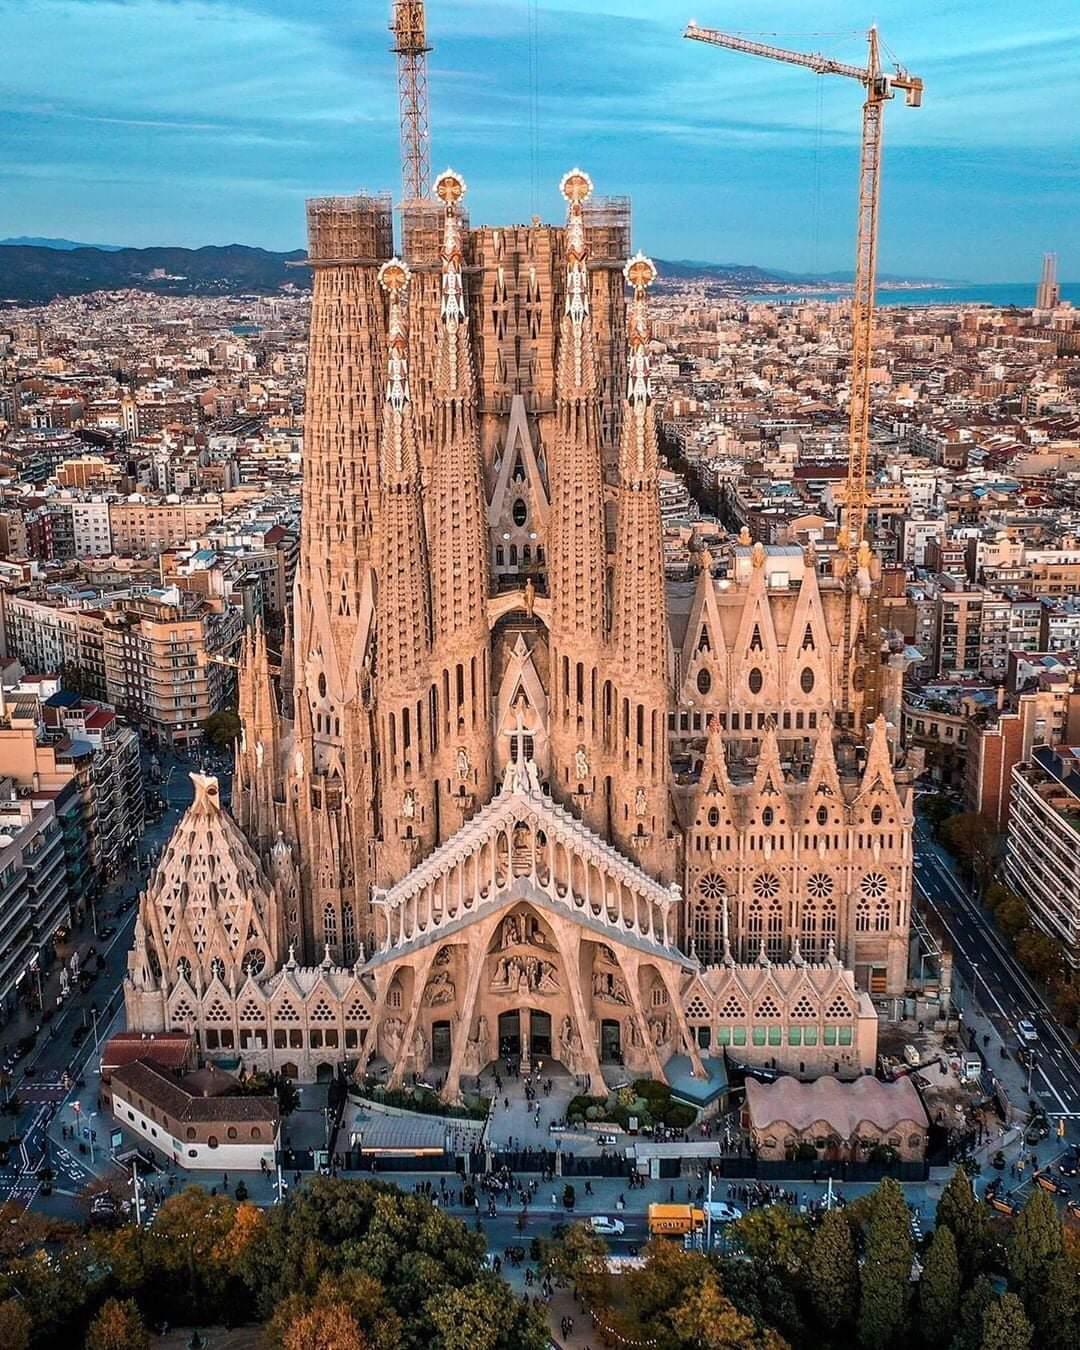 Private Jet Flights Barcelona